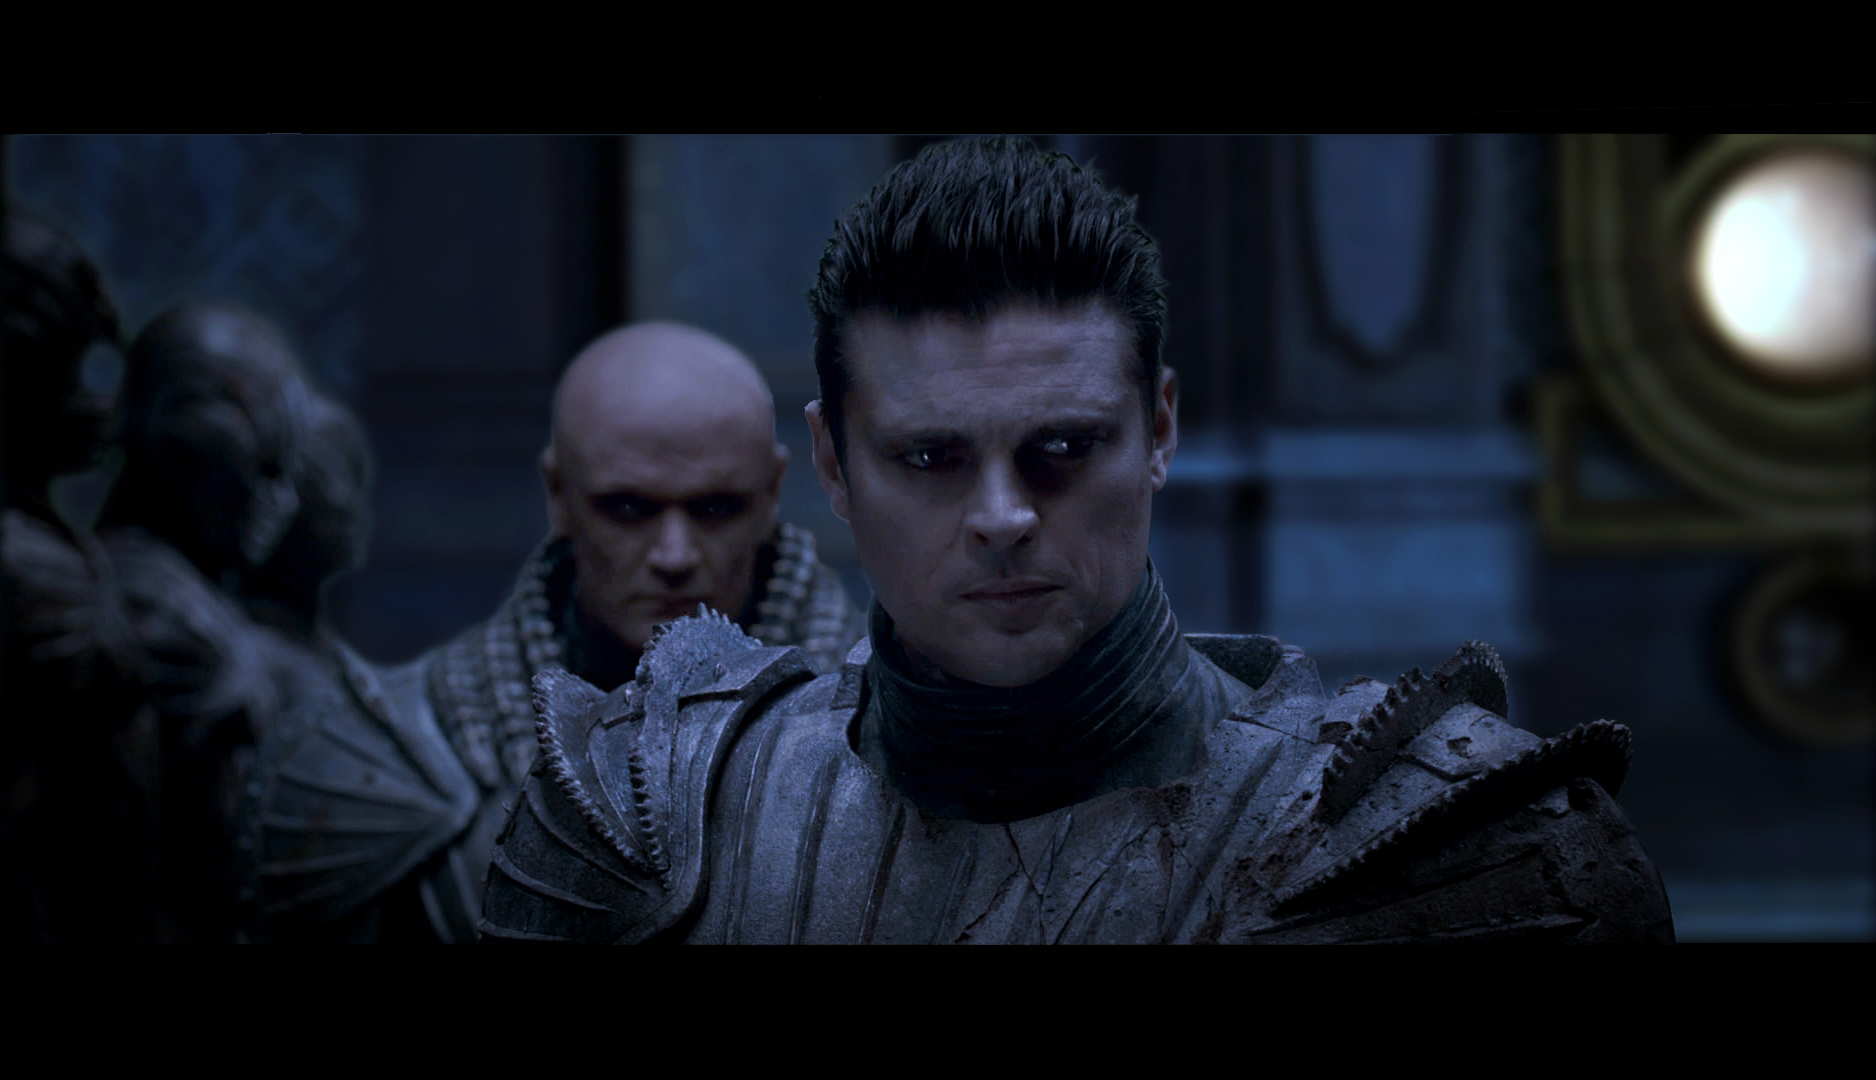 Karl urban as vaako riddick 20132 Movie Review: Riddick